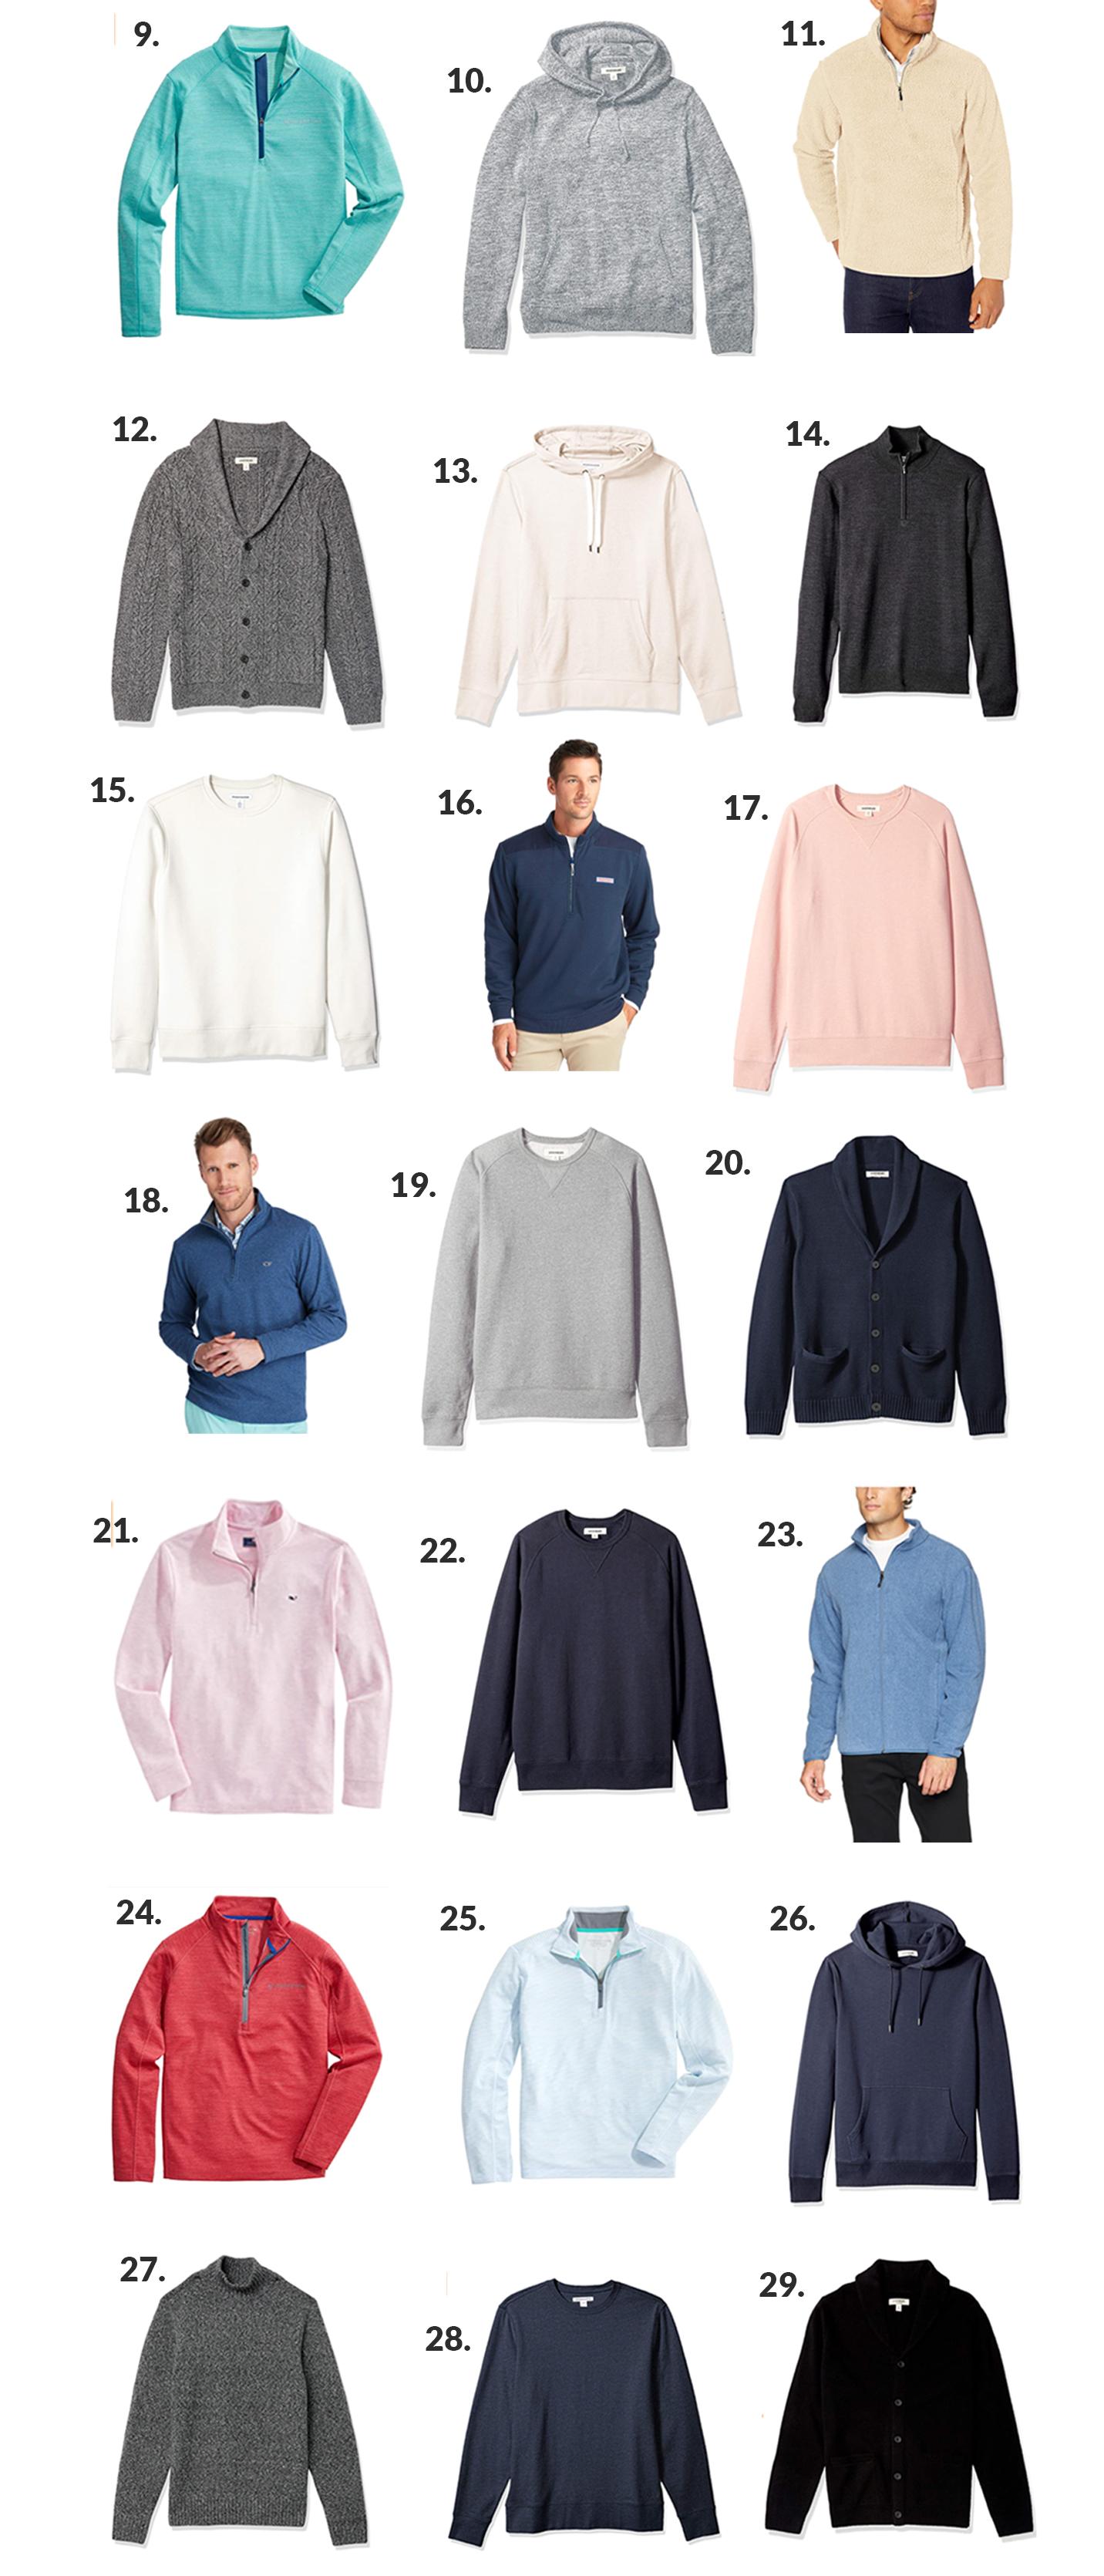 Cheap Amazon Mens Fashion guide